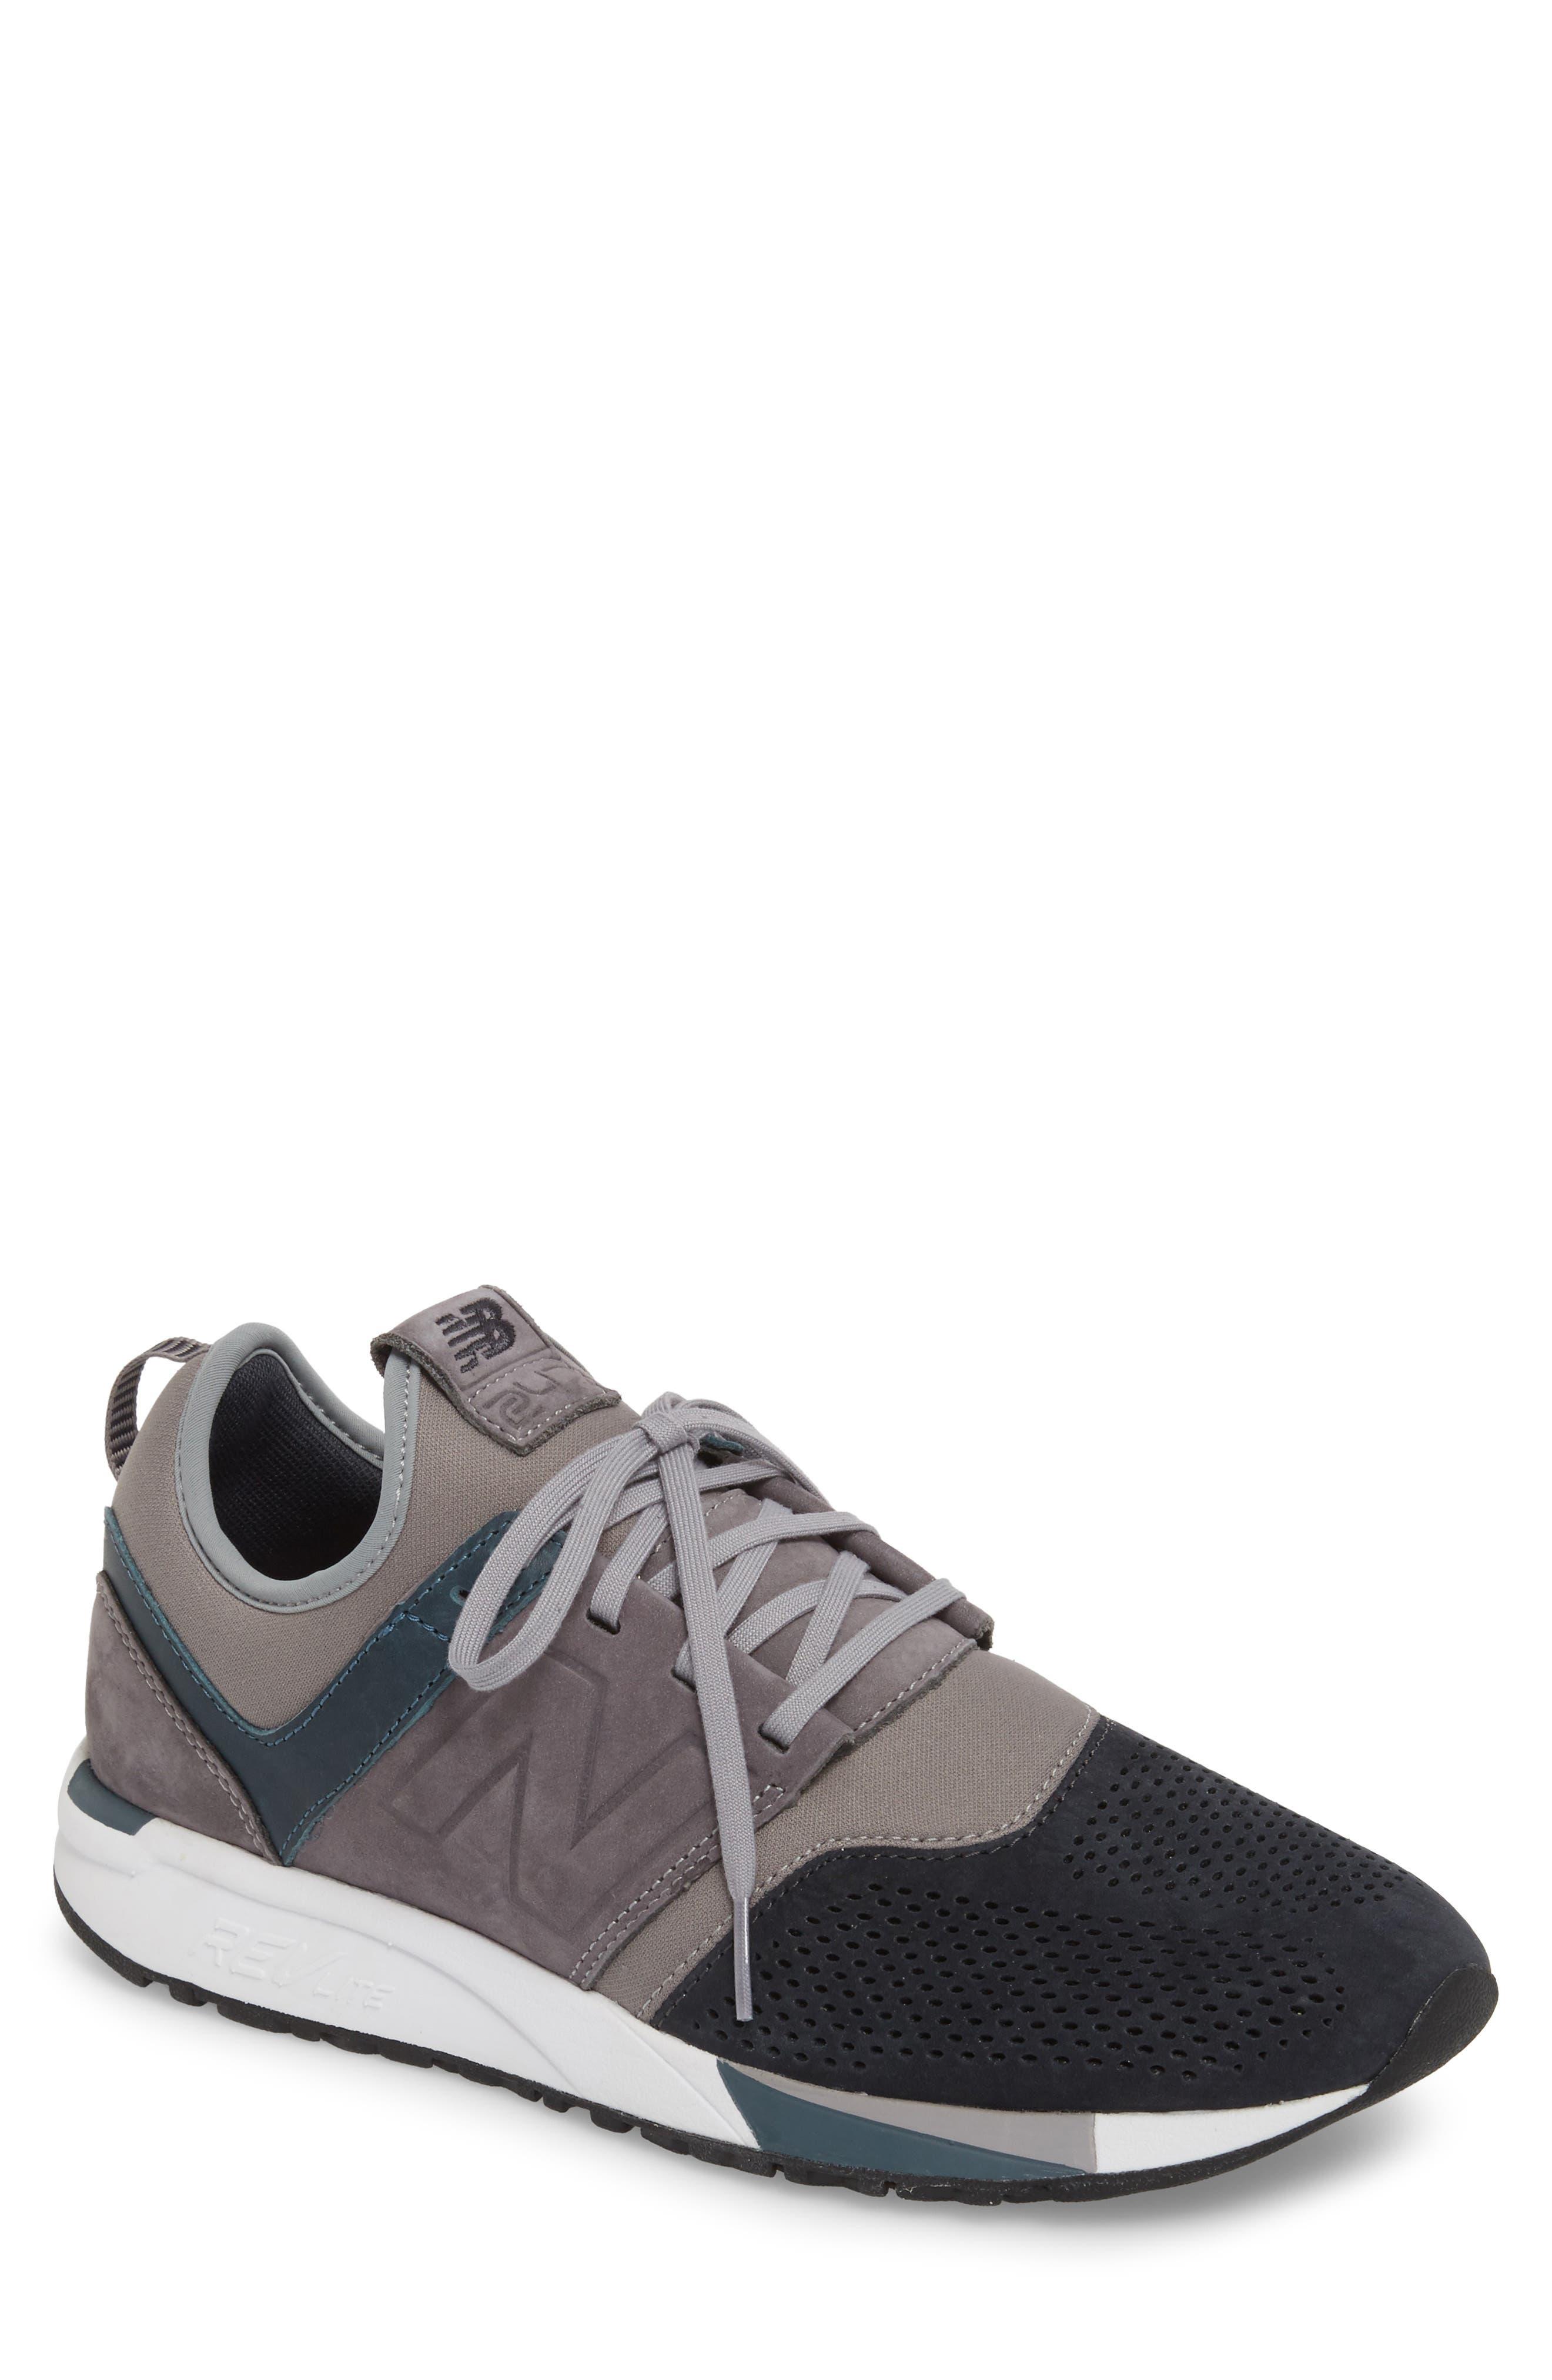 Alternate Image 1 Selected - New Balance 274 Luxe Sneaker (Men)